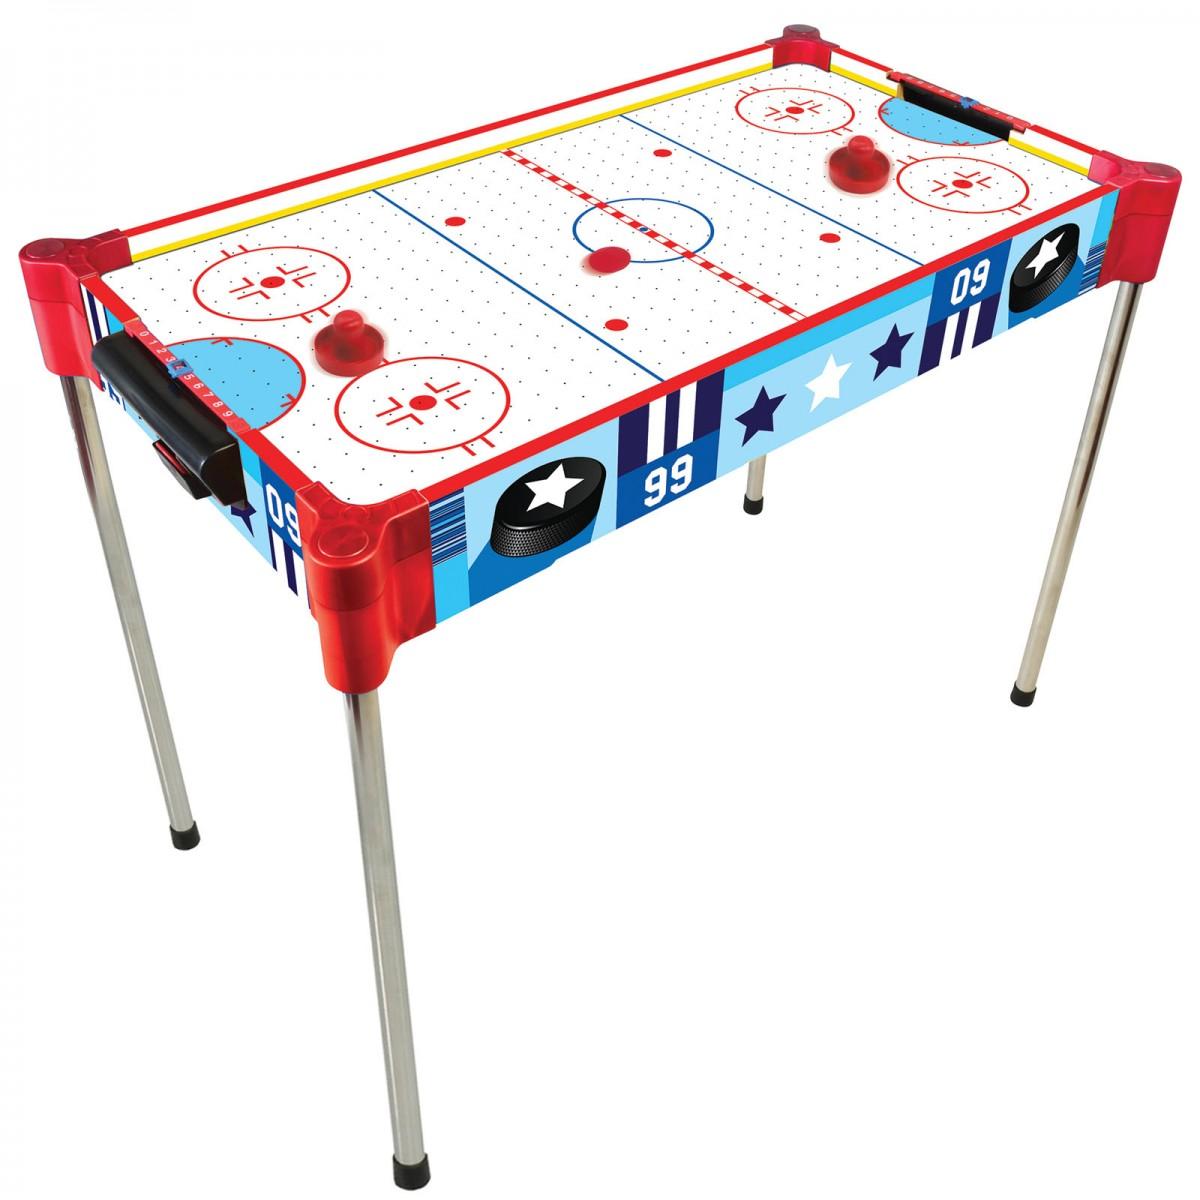 32 82cm 2 in 1 table tabletop air hockey - Tournament air hockey table ...